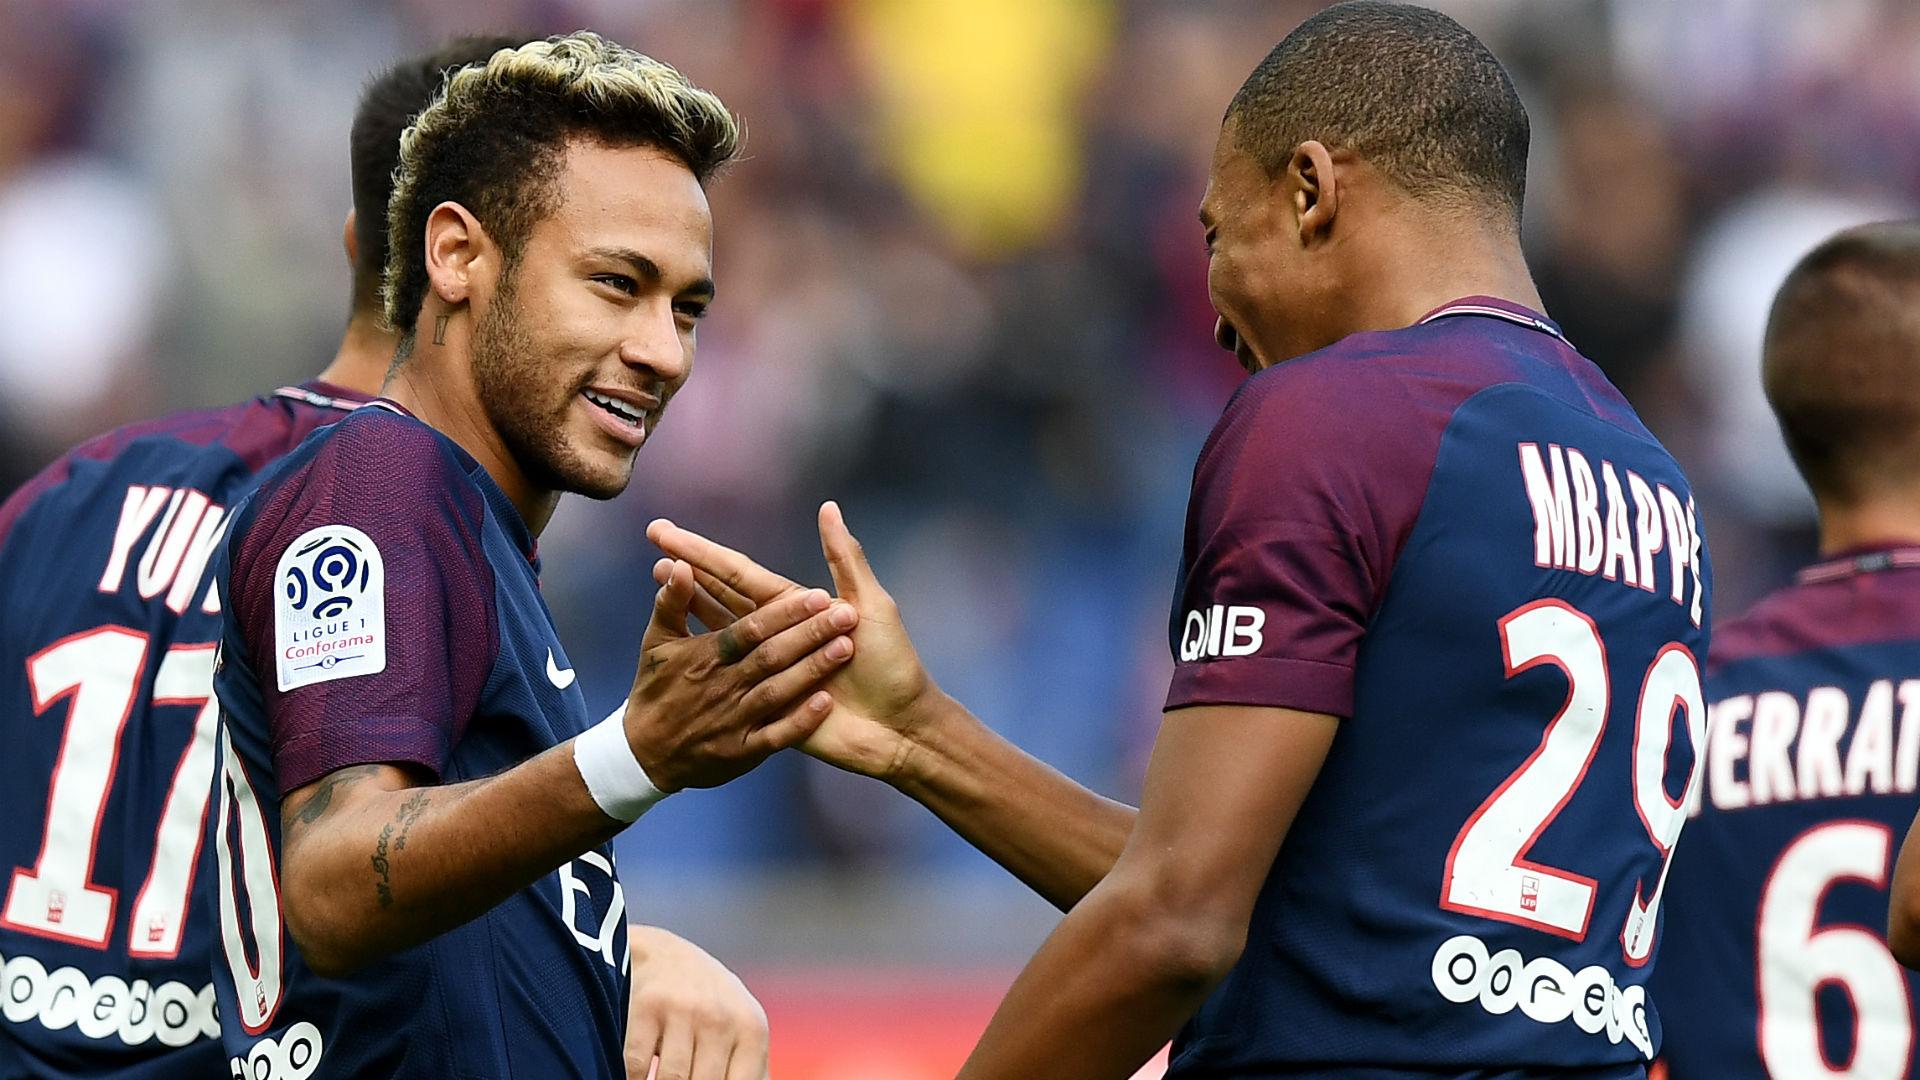 Neymar Kylian Mbappe PSG Bordeaux Ligue 1 30092017